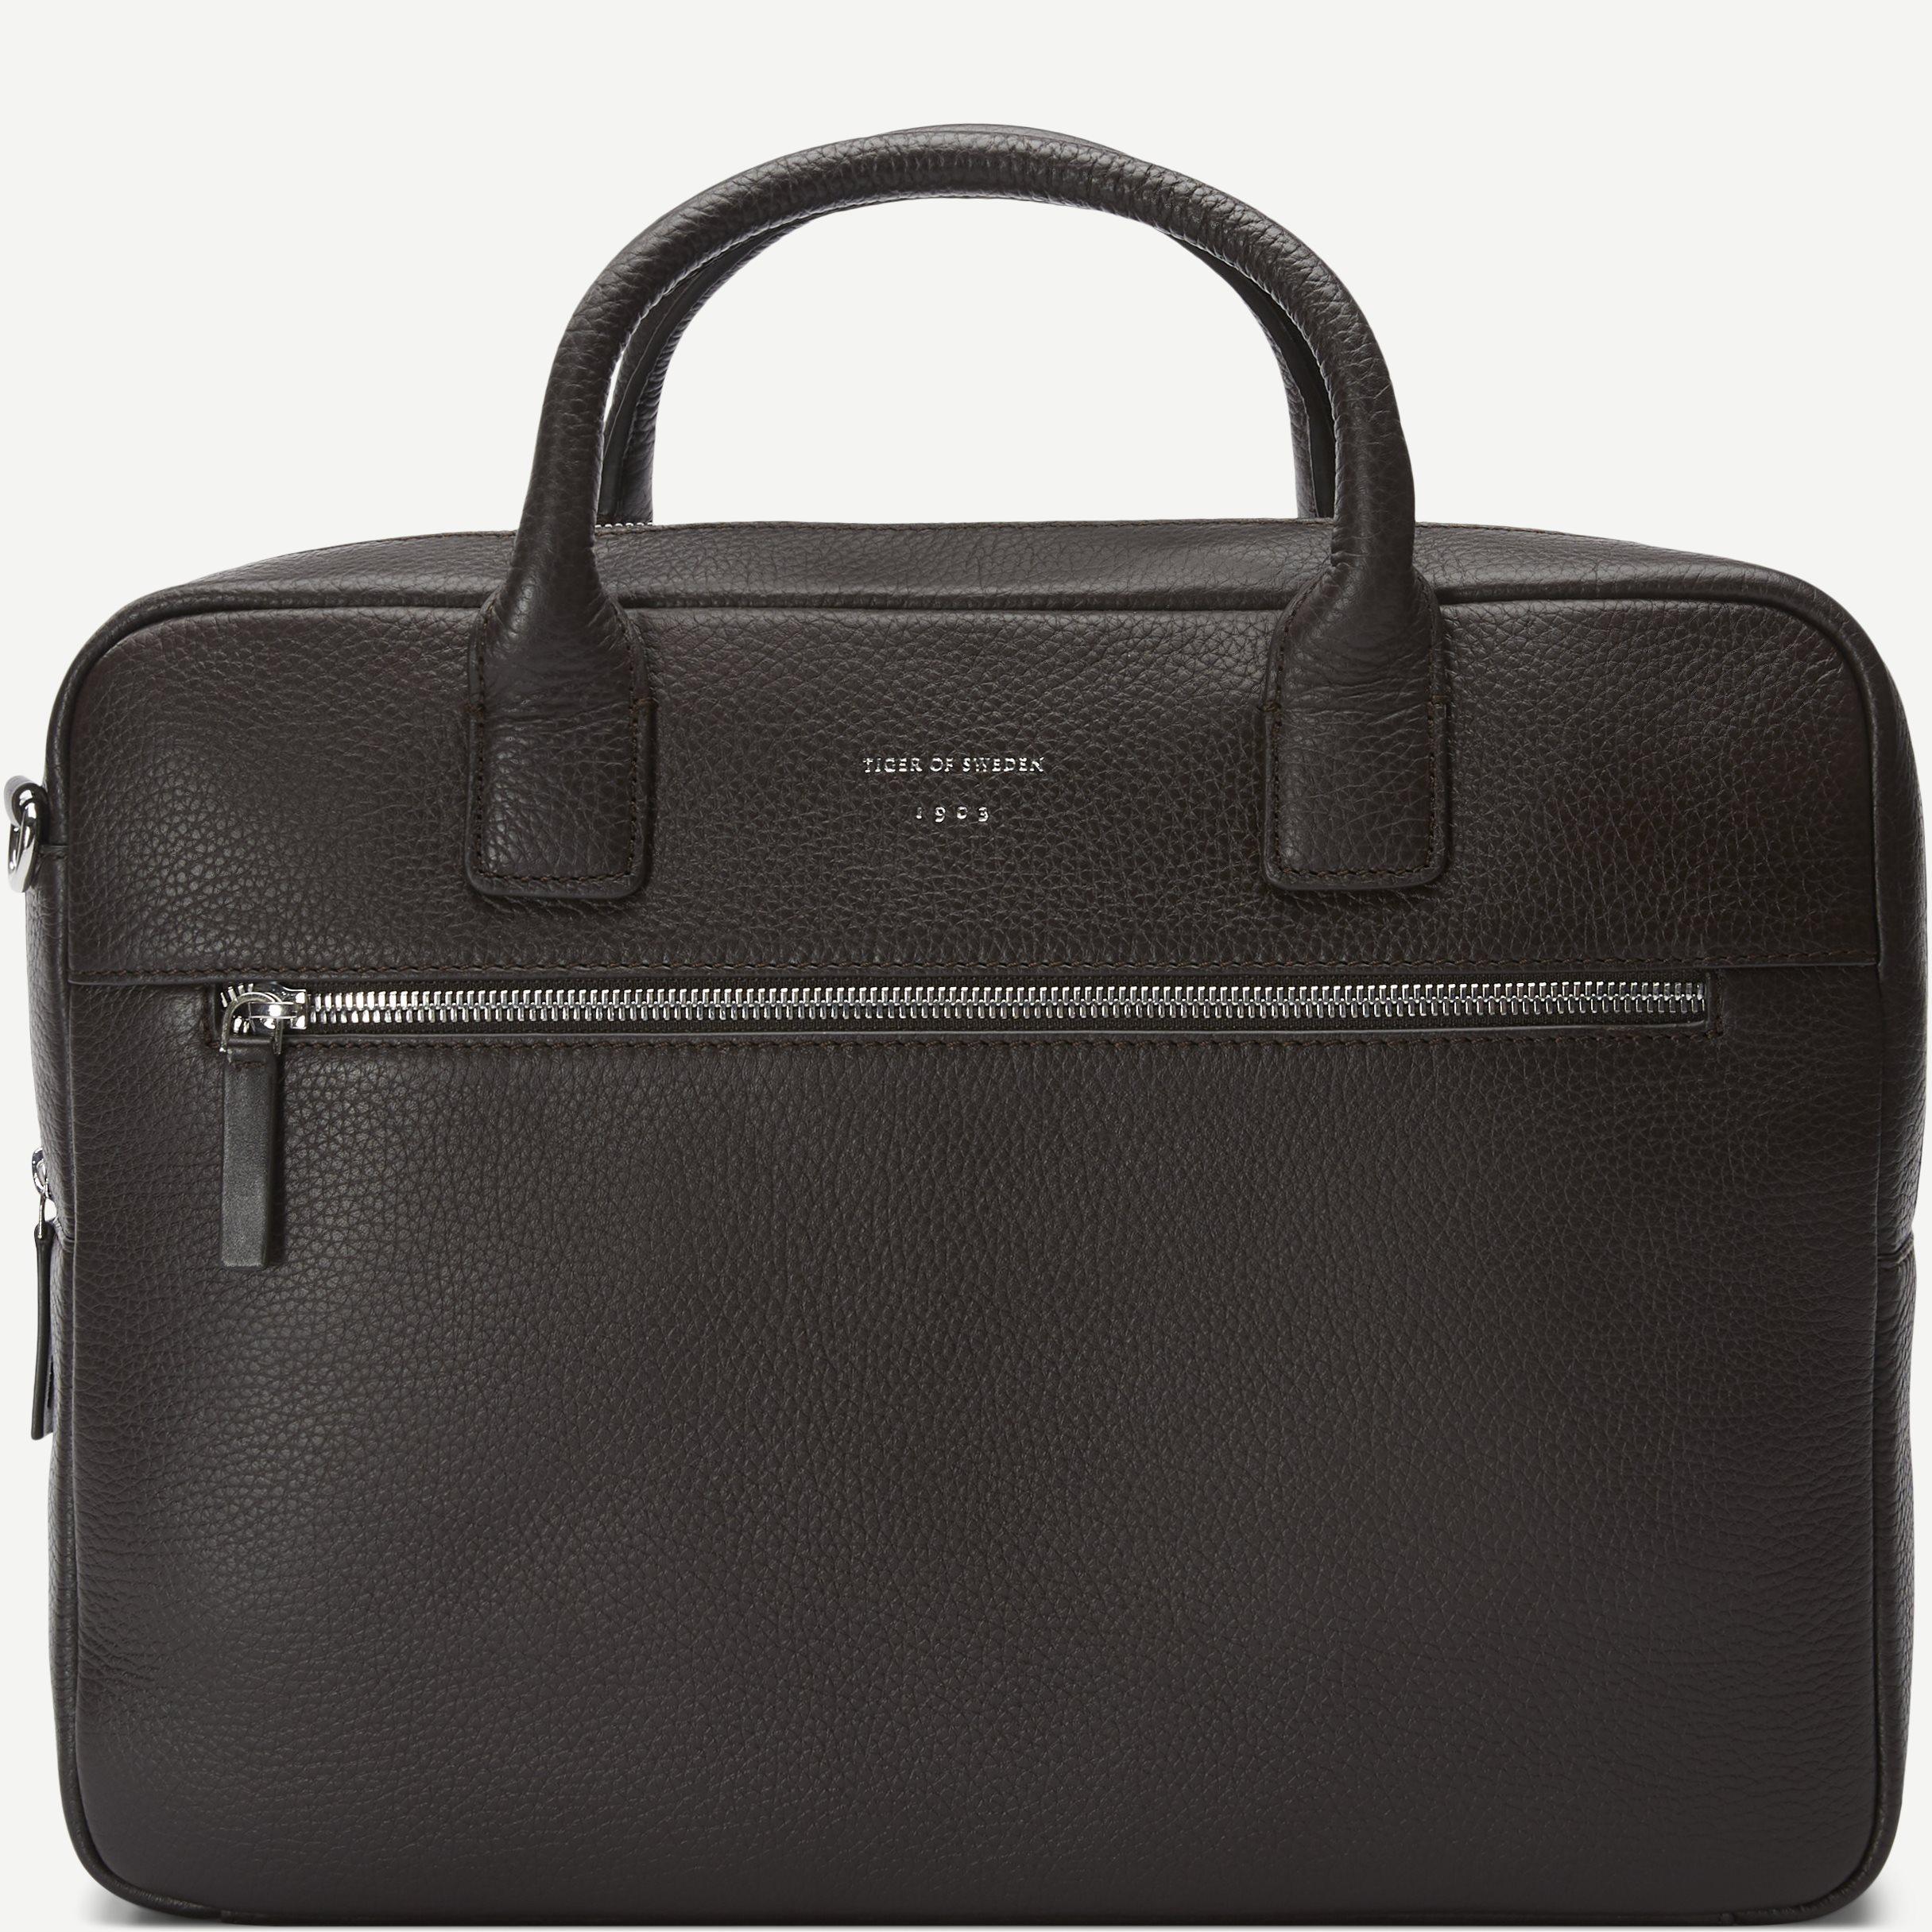 Beckholmen Bag - Bags - Brown